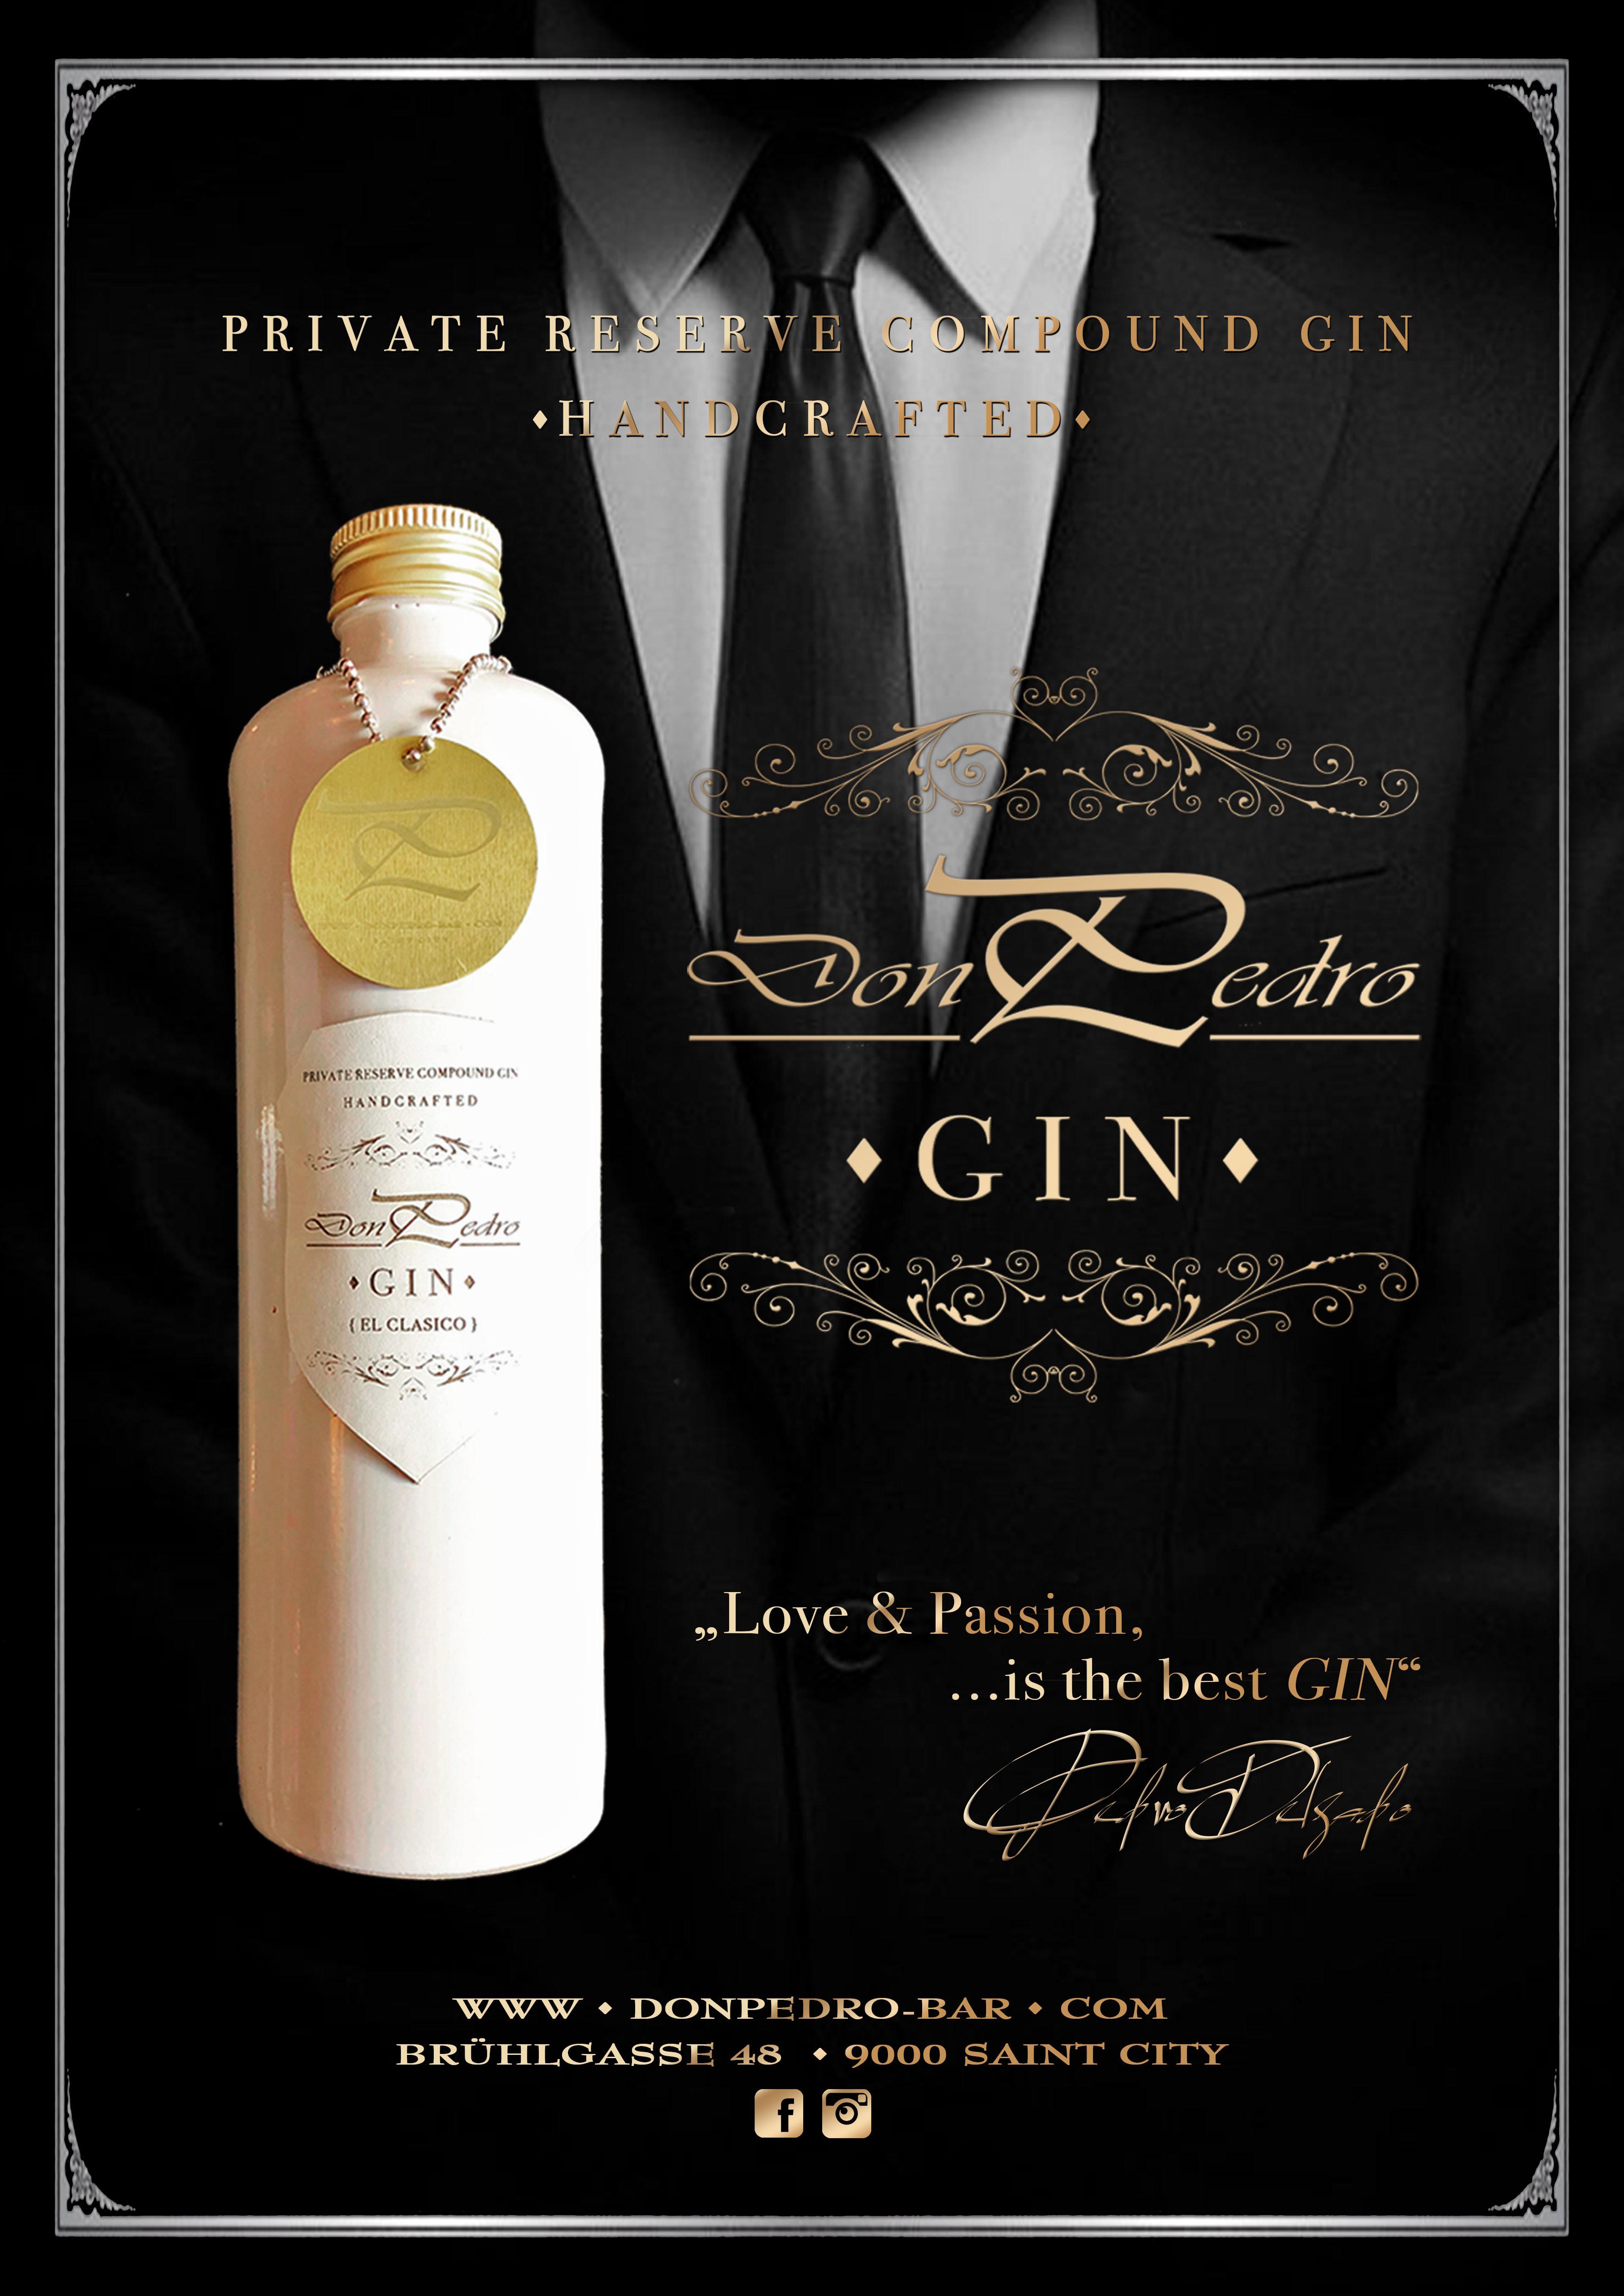 THE DON PEDRO MENU Gin Publicity